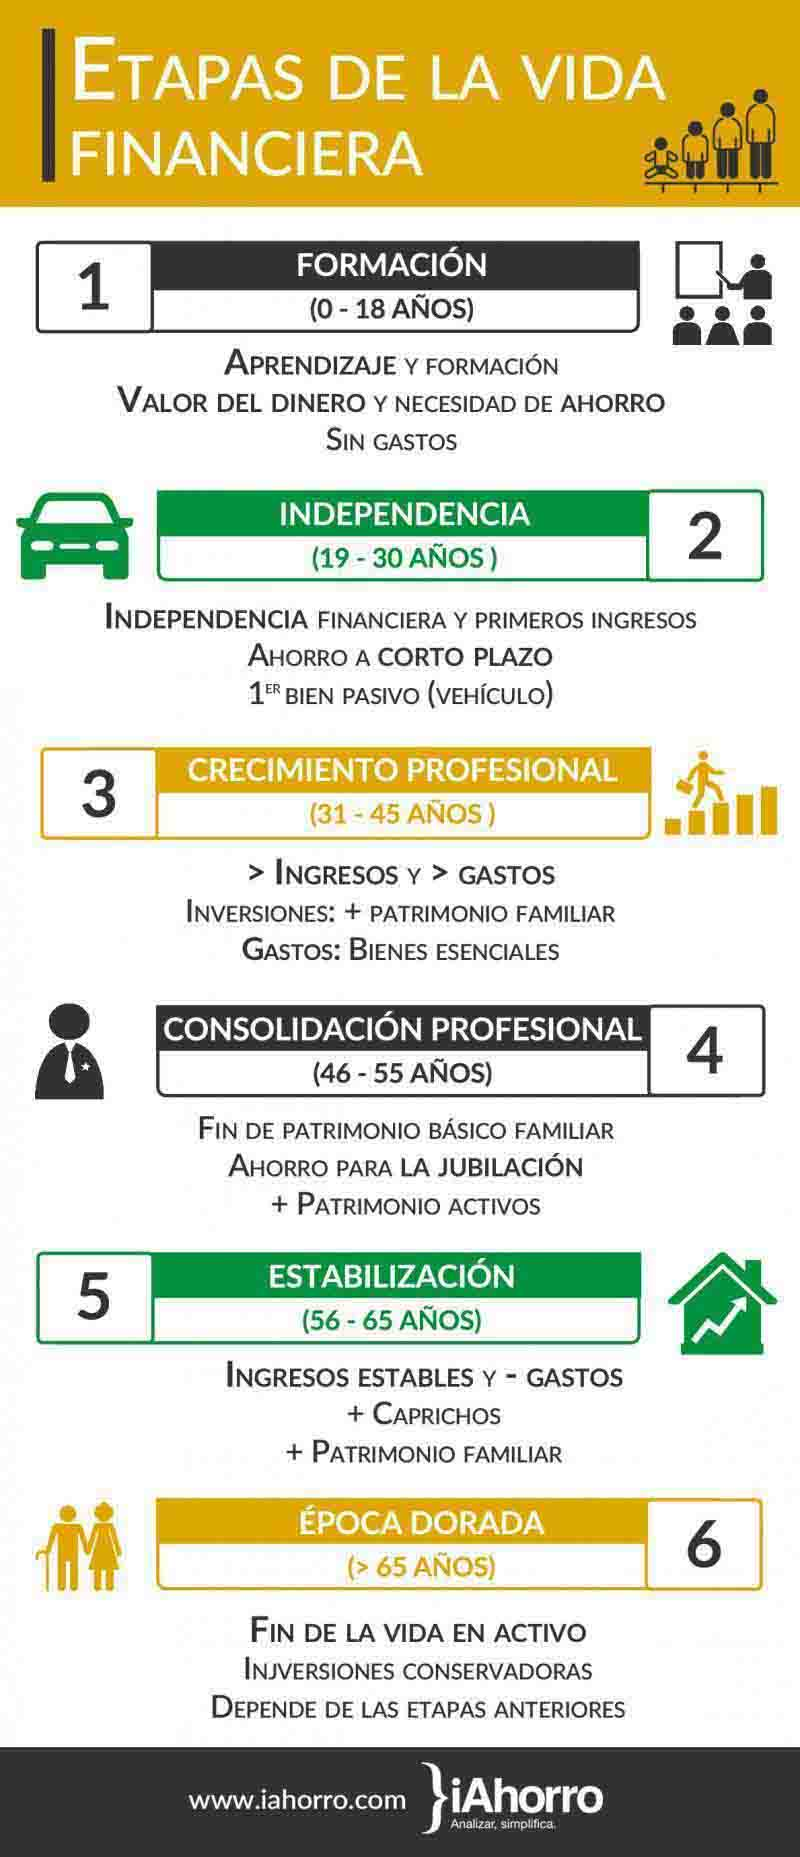 cuales_son_las_seis_etapas_de_la_vida_financiera